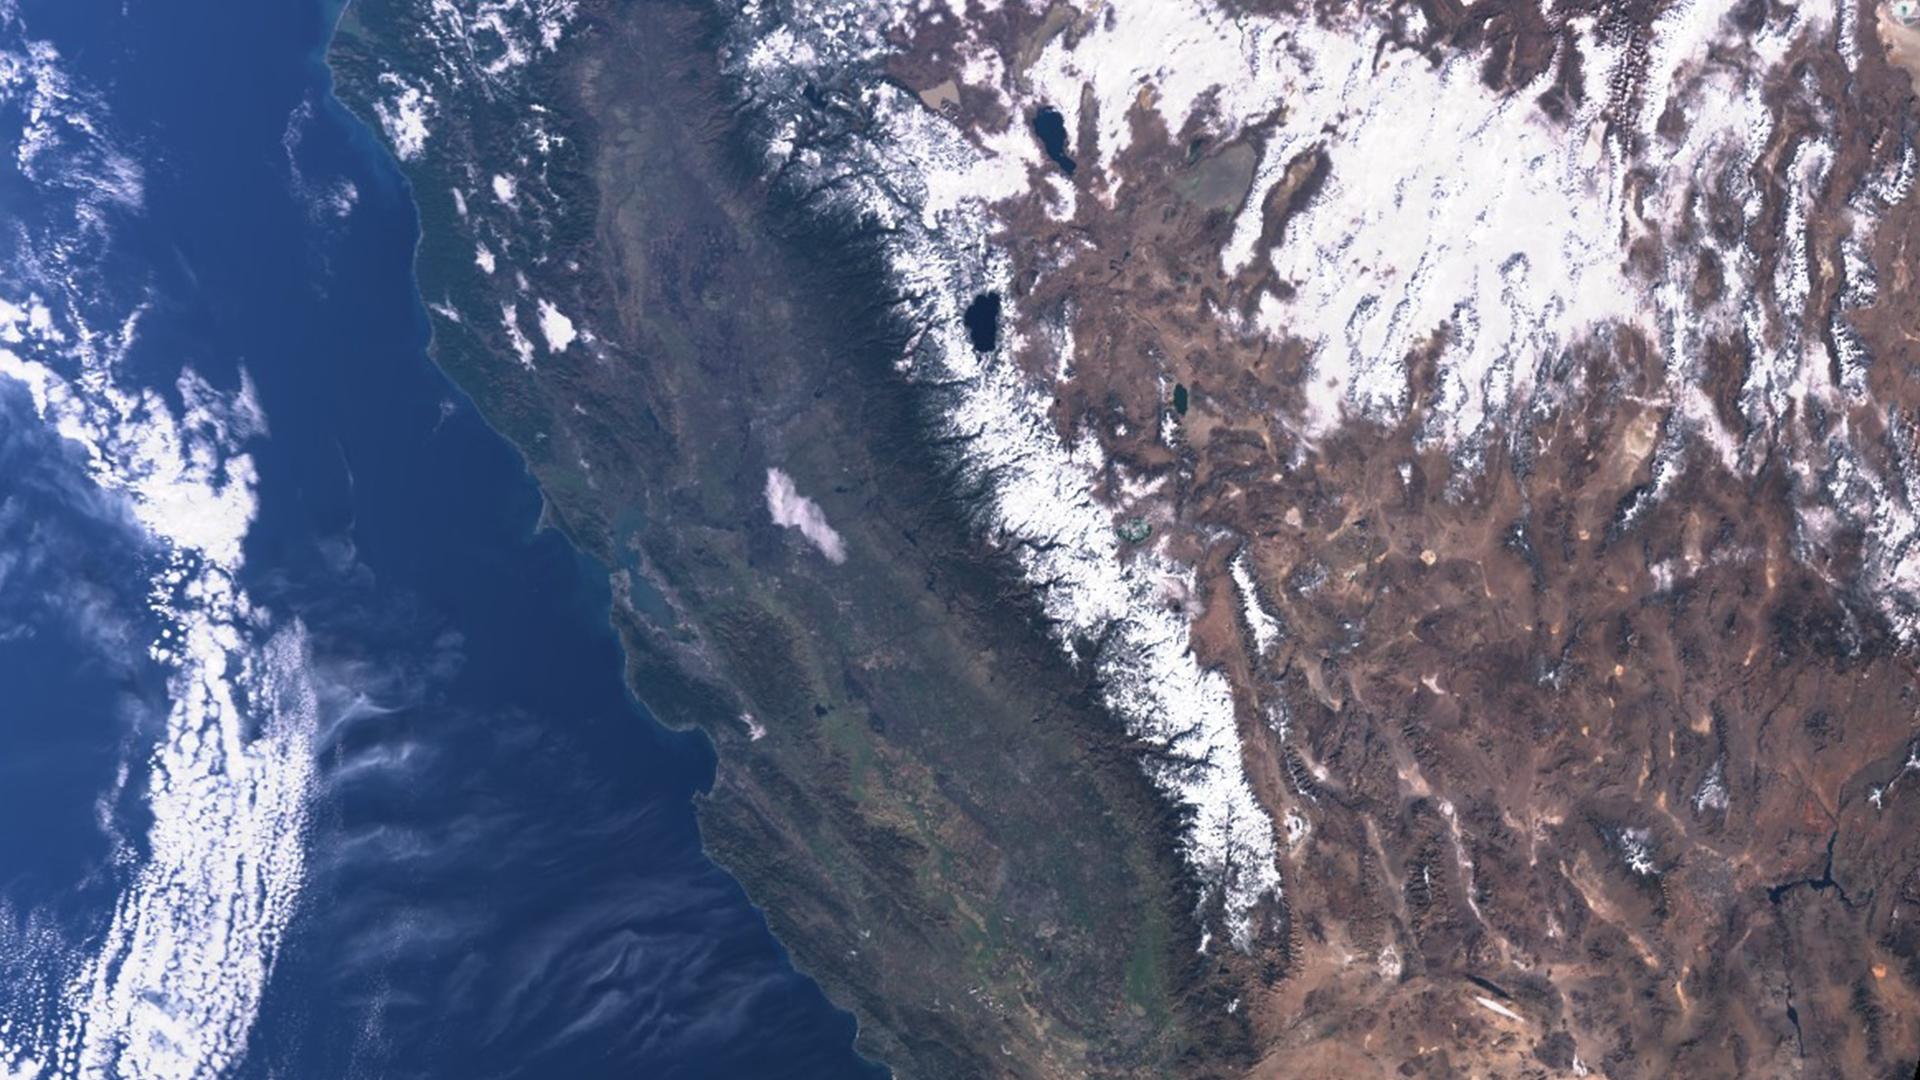 Satellite imagery shows snow blanketing the Sierra Nevada on Dec. 16, 2019. (Credit: Sentinel-3/European Space Agency)